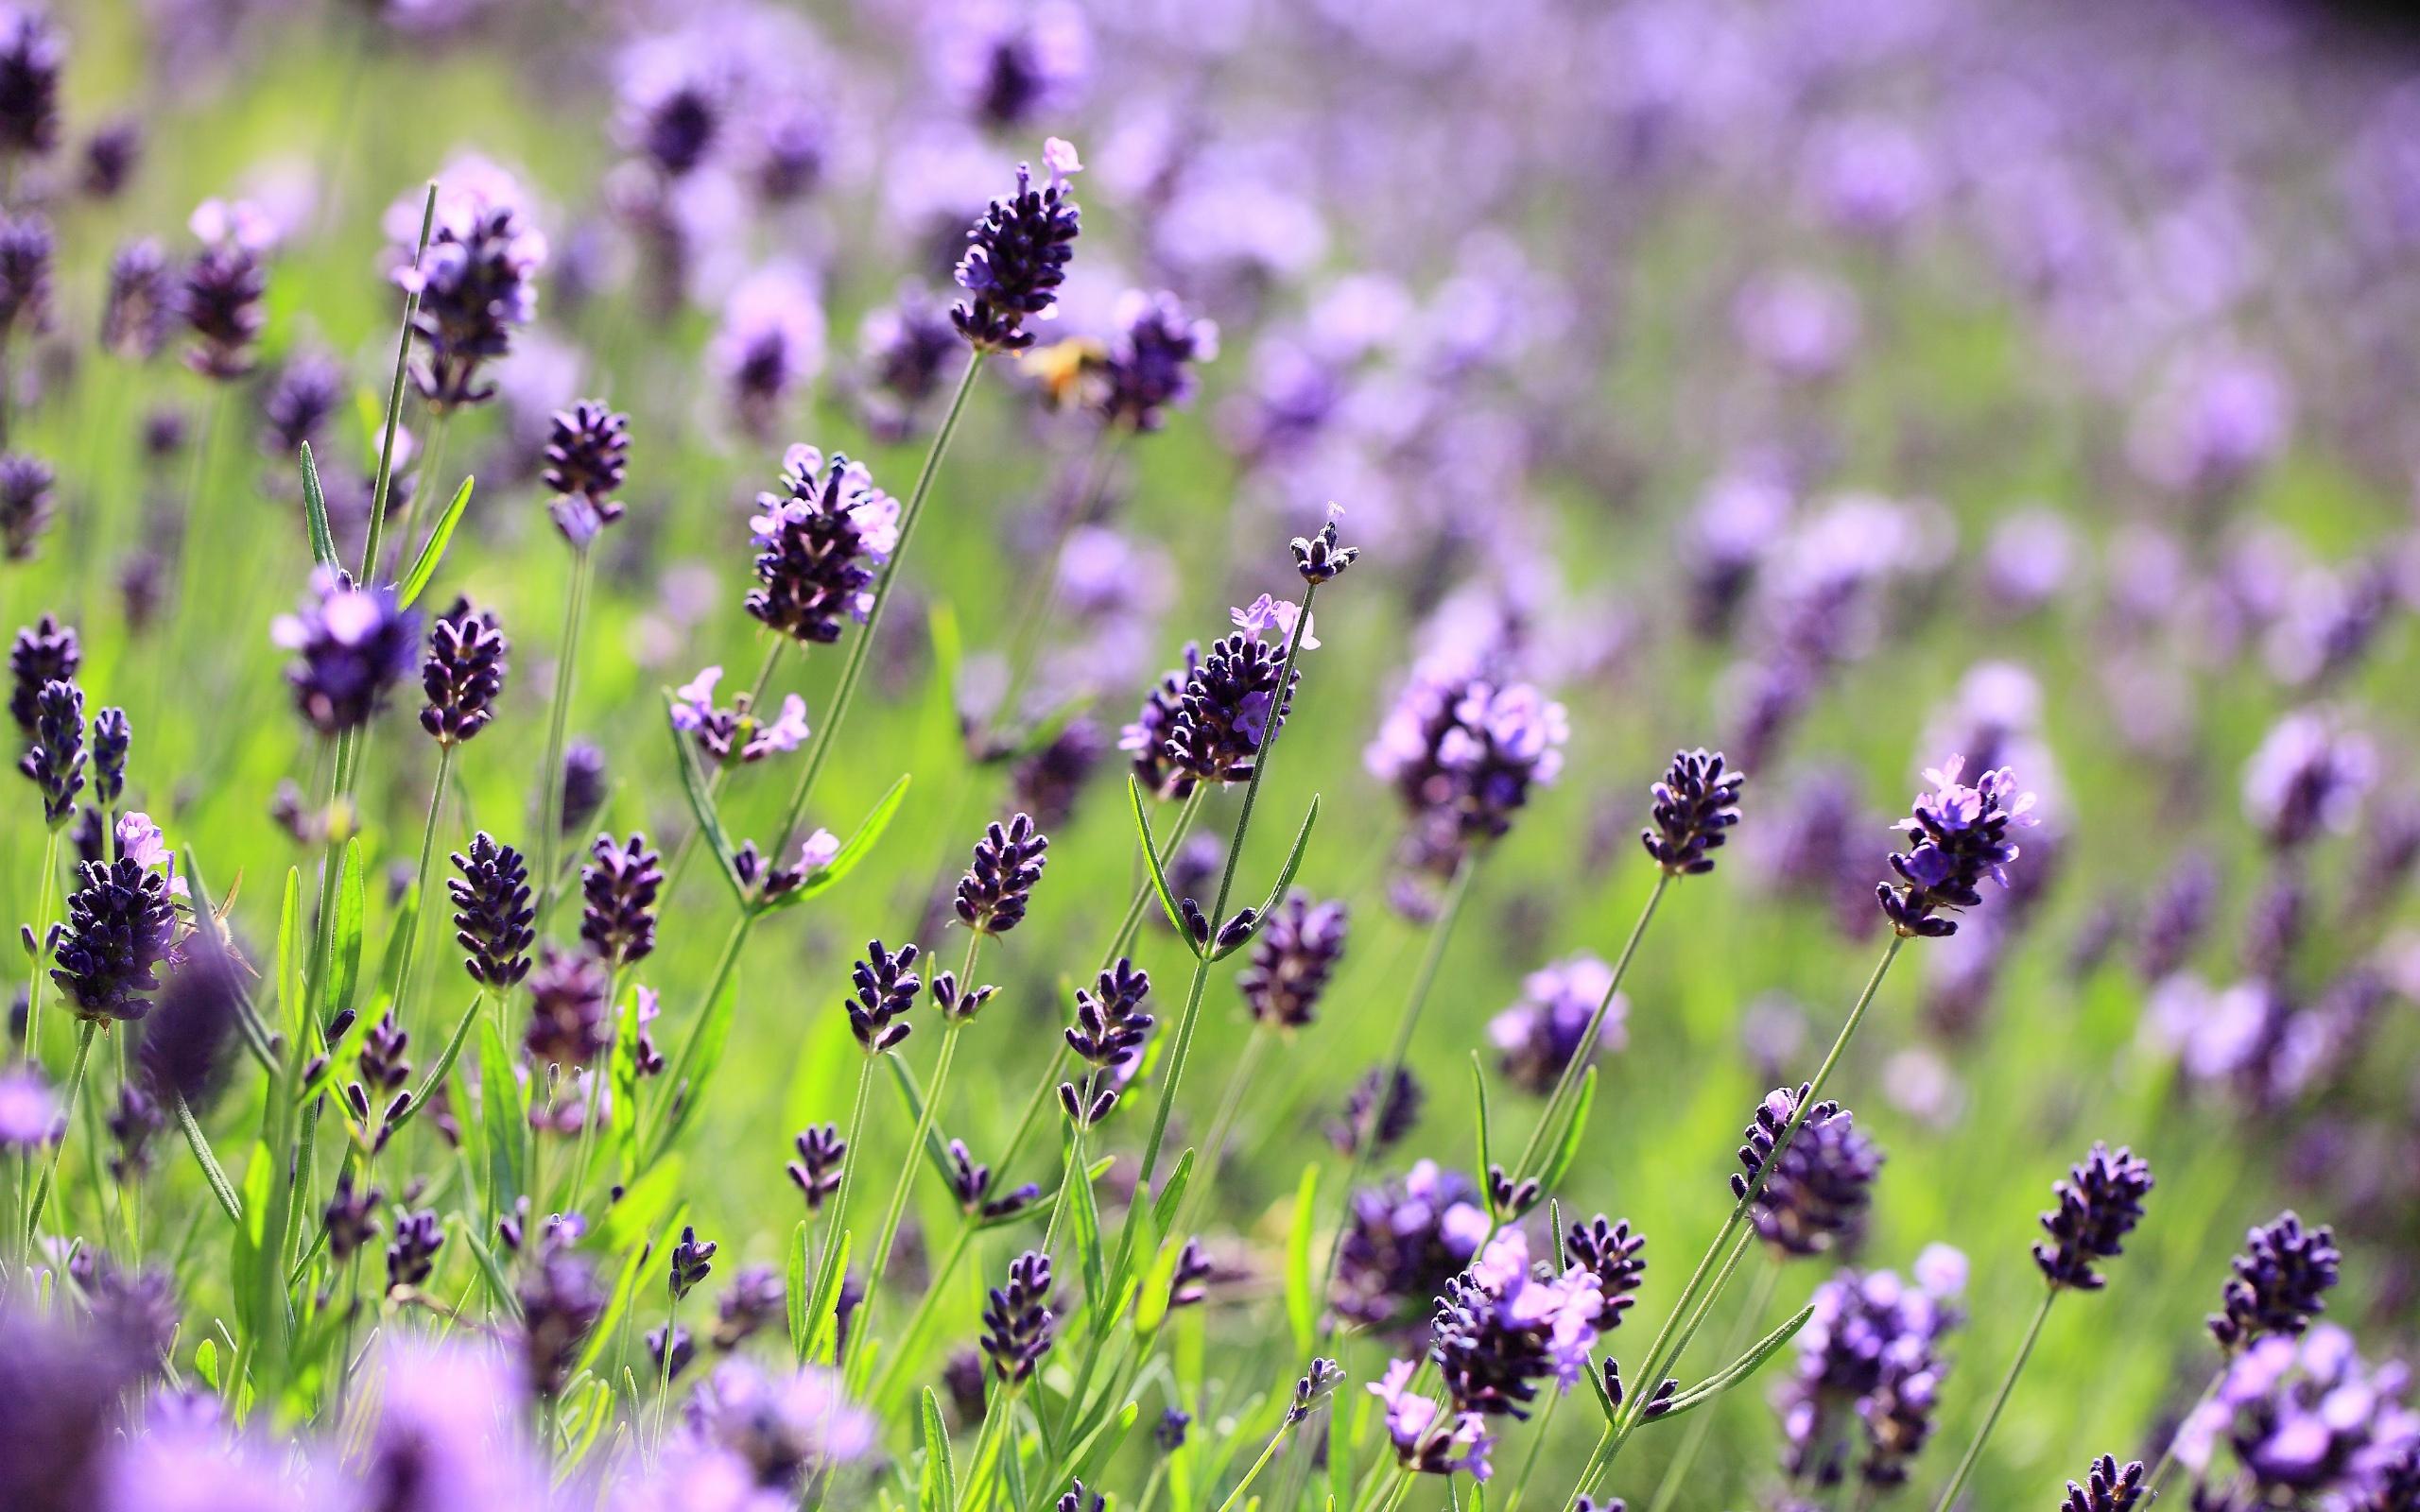 lavendel lila blumen feld wiese verschwommen close up 2560x1600 hd hintergrundbilder hd bild. Black Bedroom Furniture Sets. Home Design Ideas